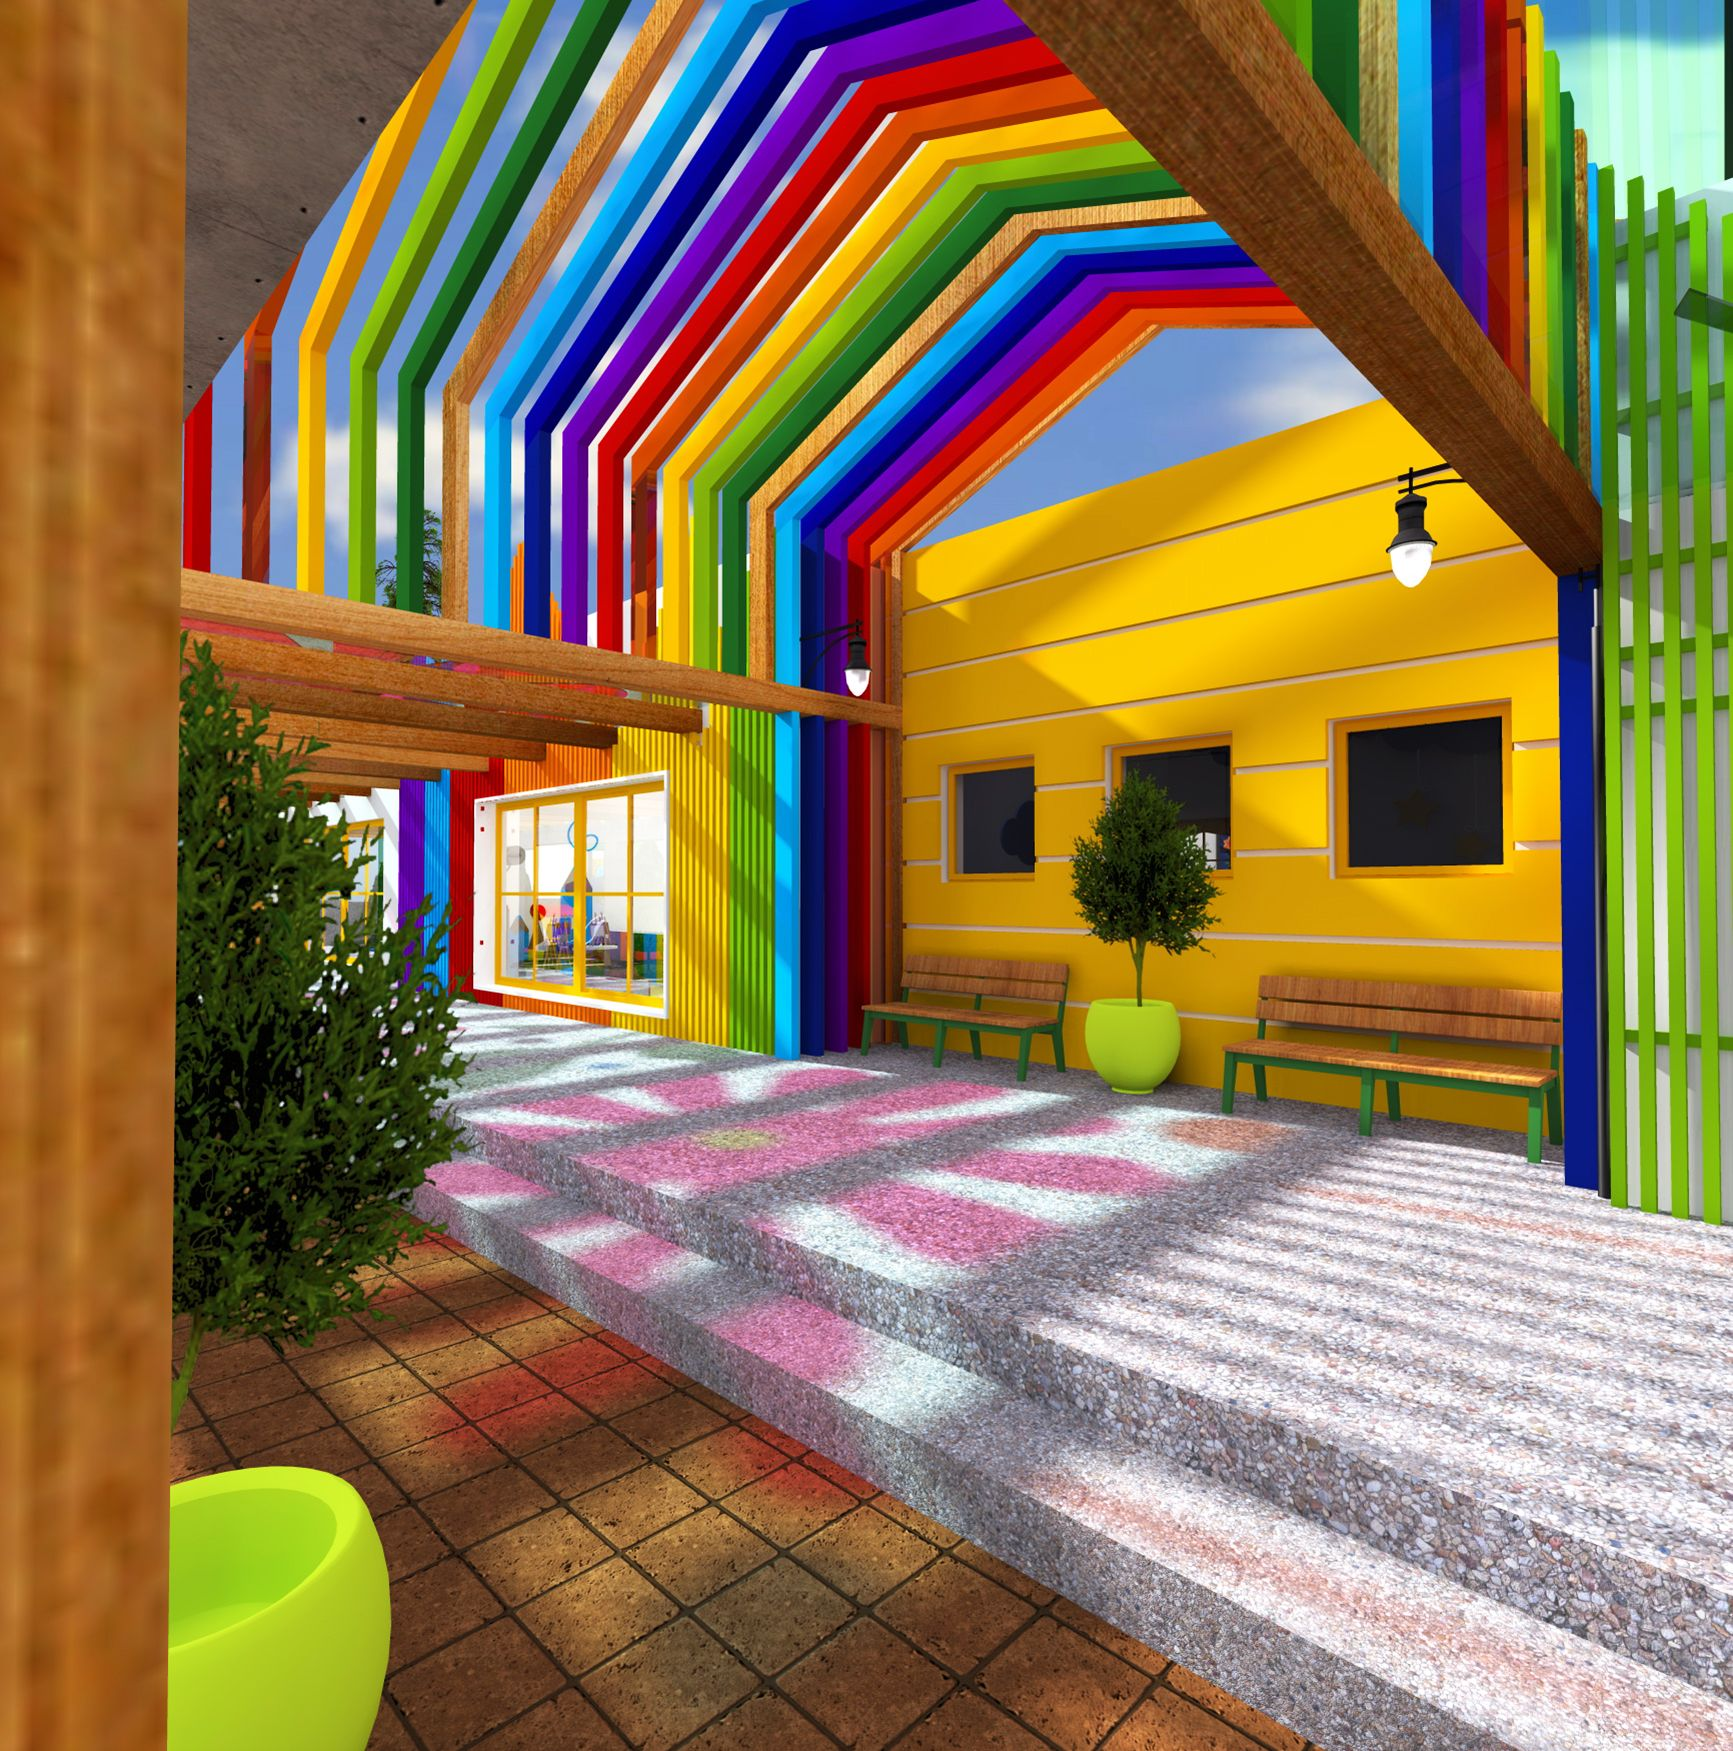 Kindergarten Exterior Design - Colorful Spaces - Mandala Floor -